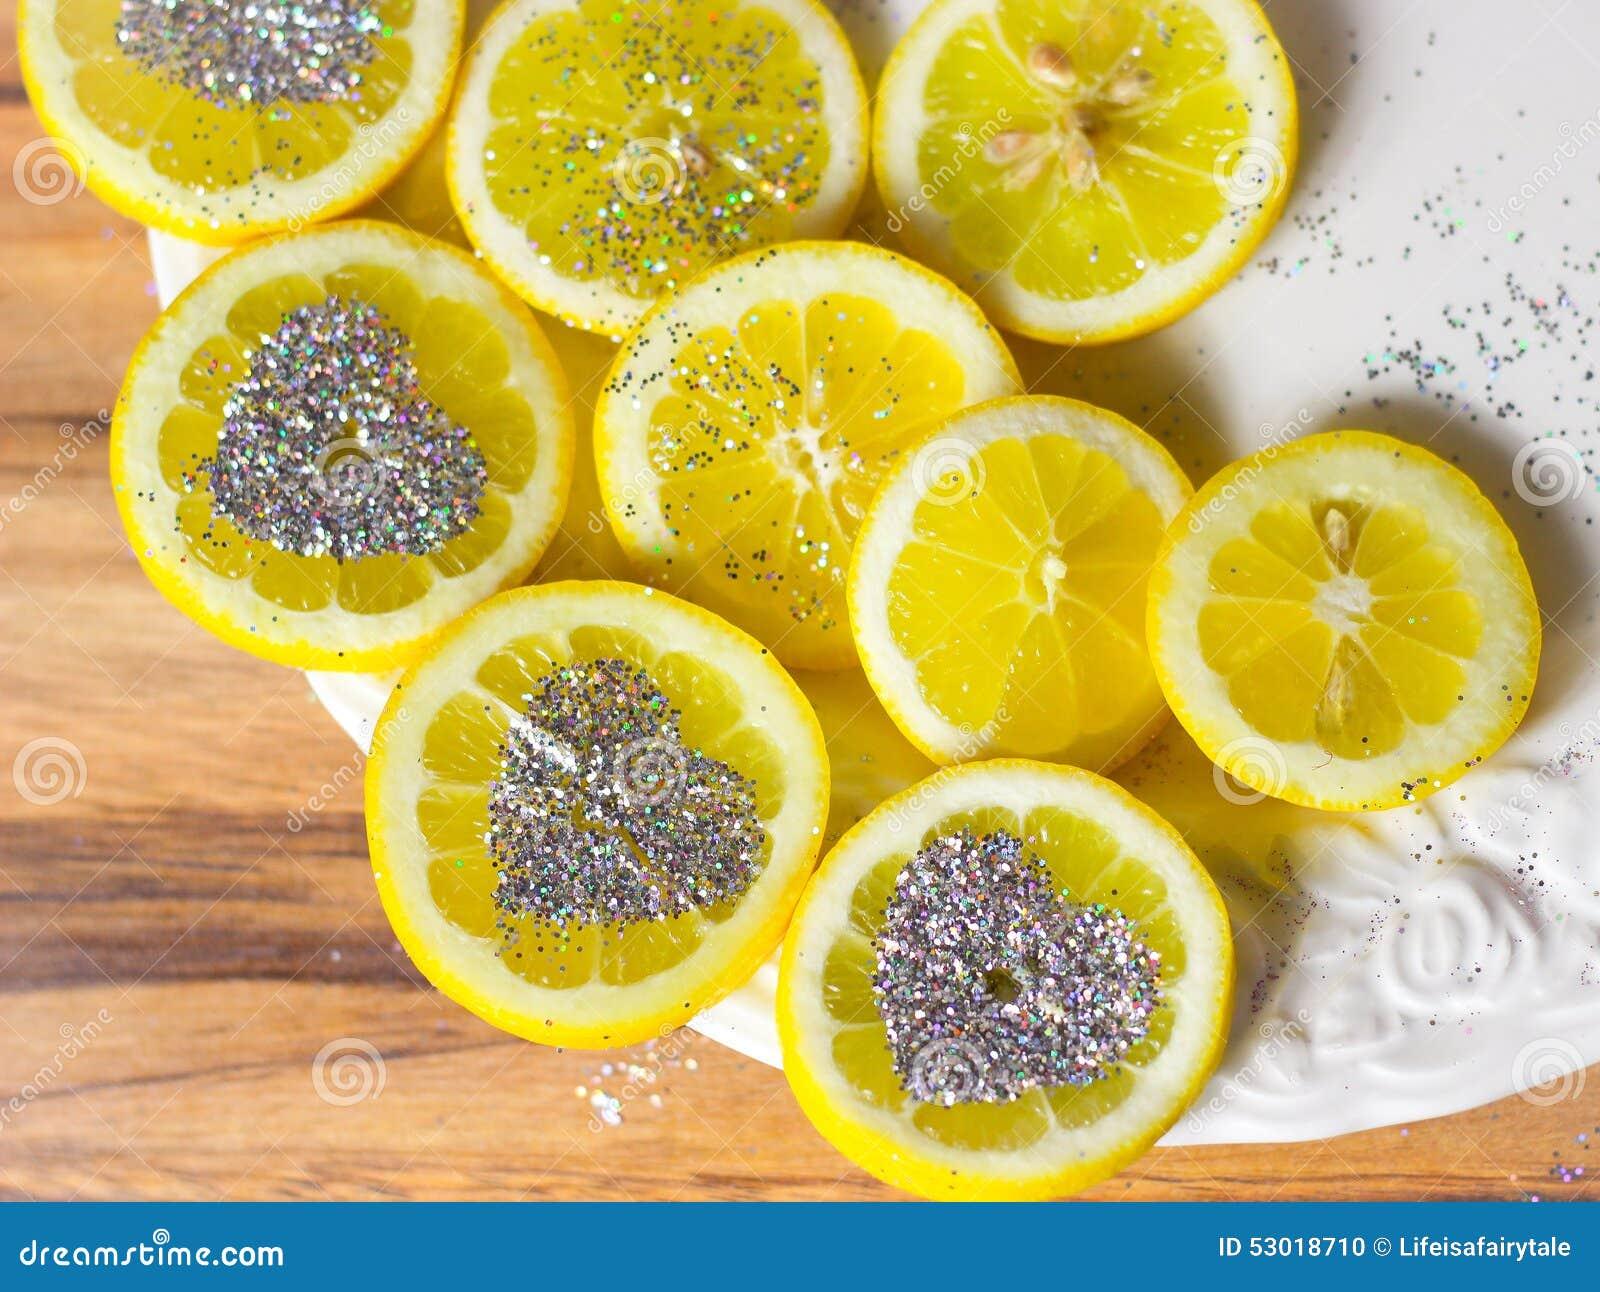 Id love to lick a lemon